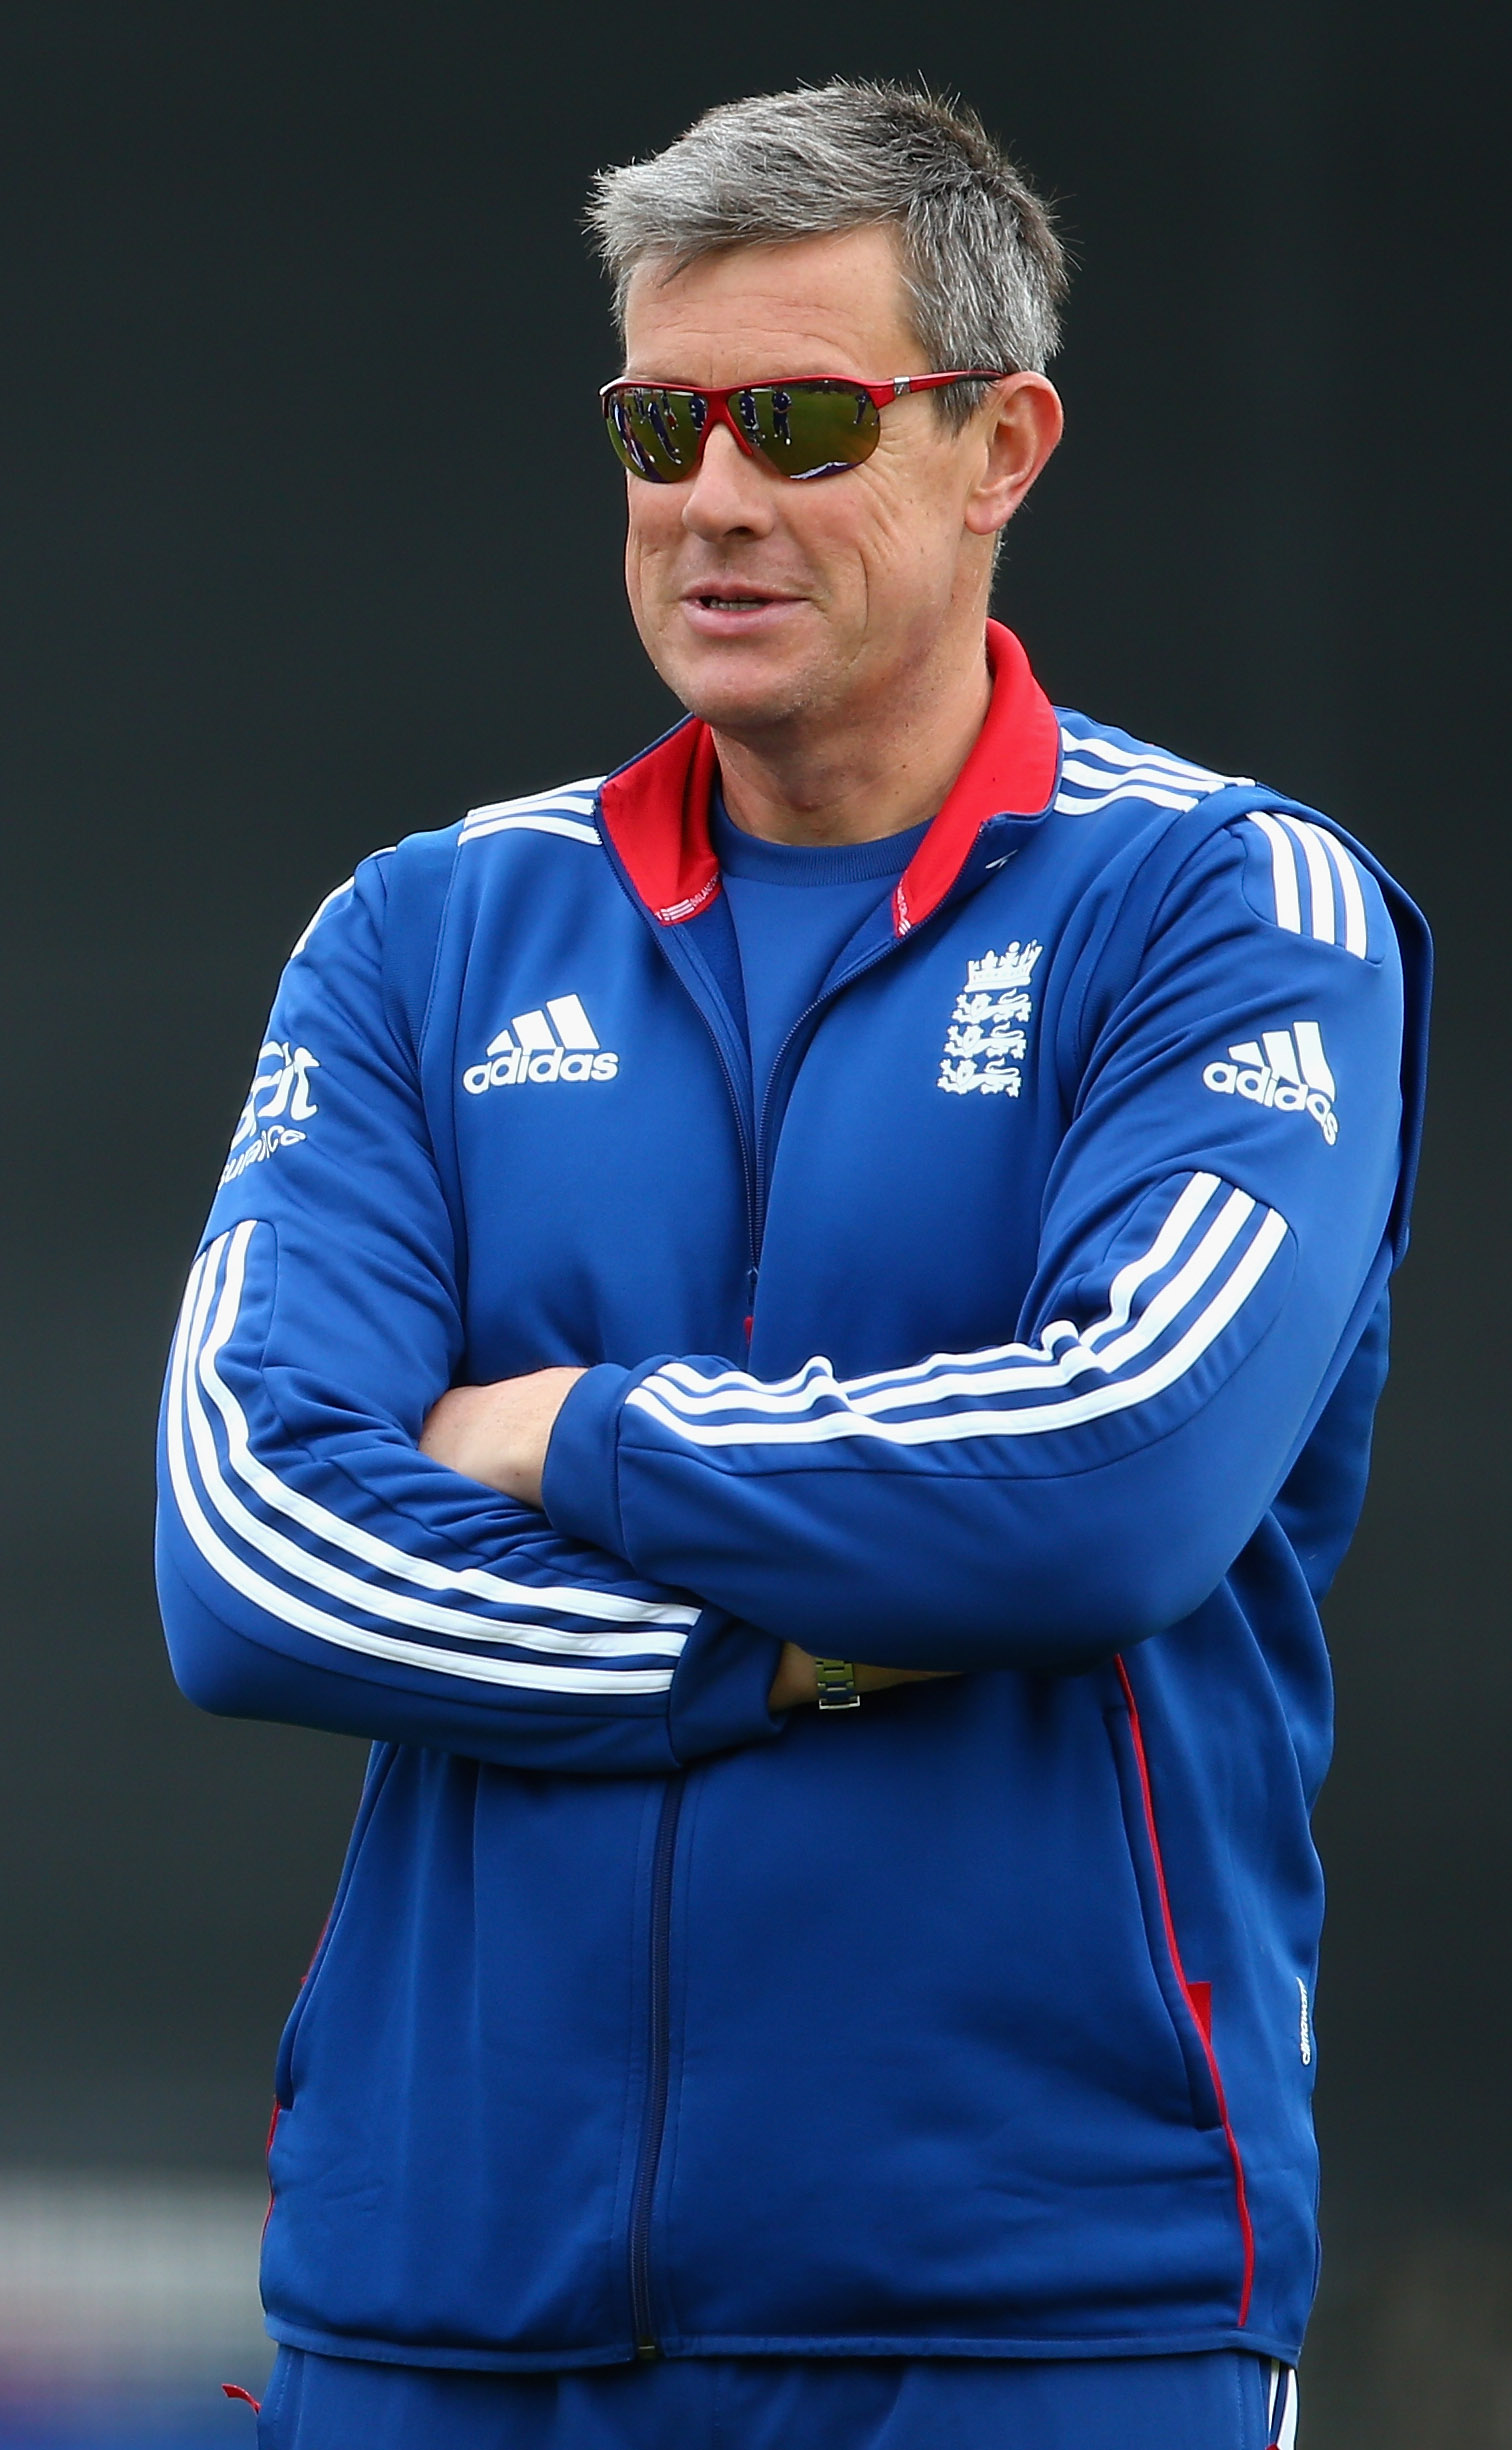 England coach Ashley Giles admits delight at Australia struggles